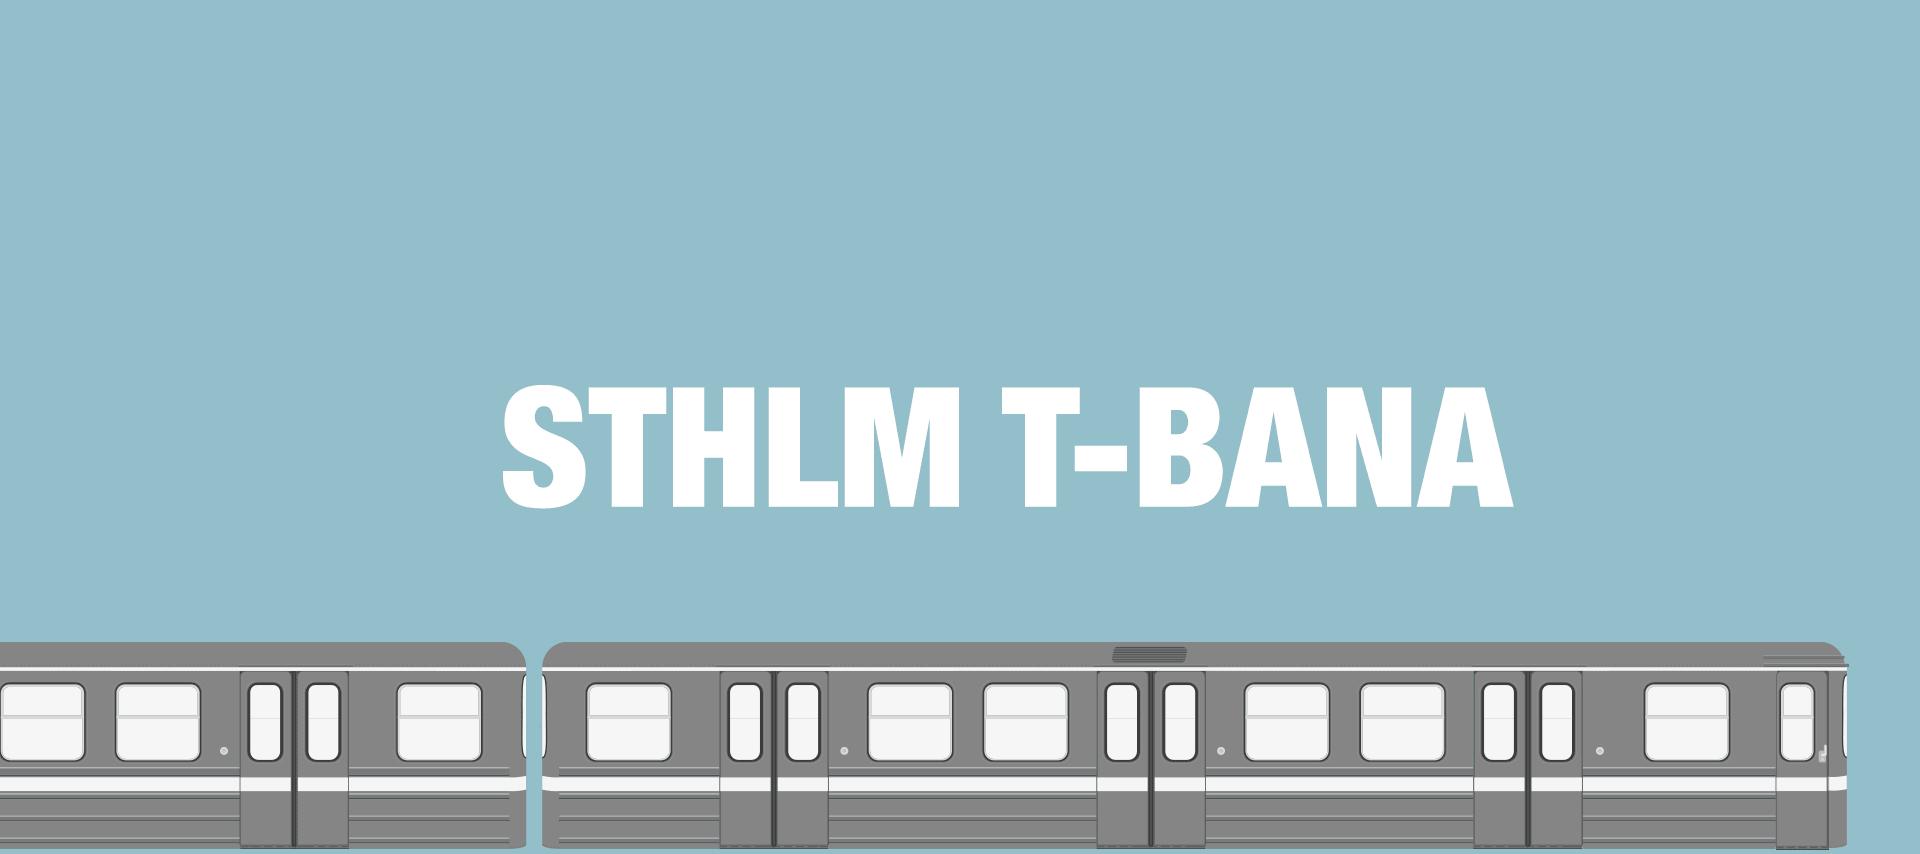 Sthlm T-bana